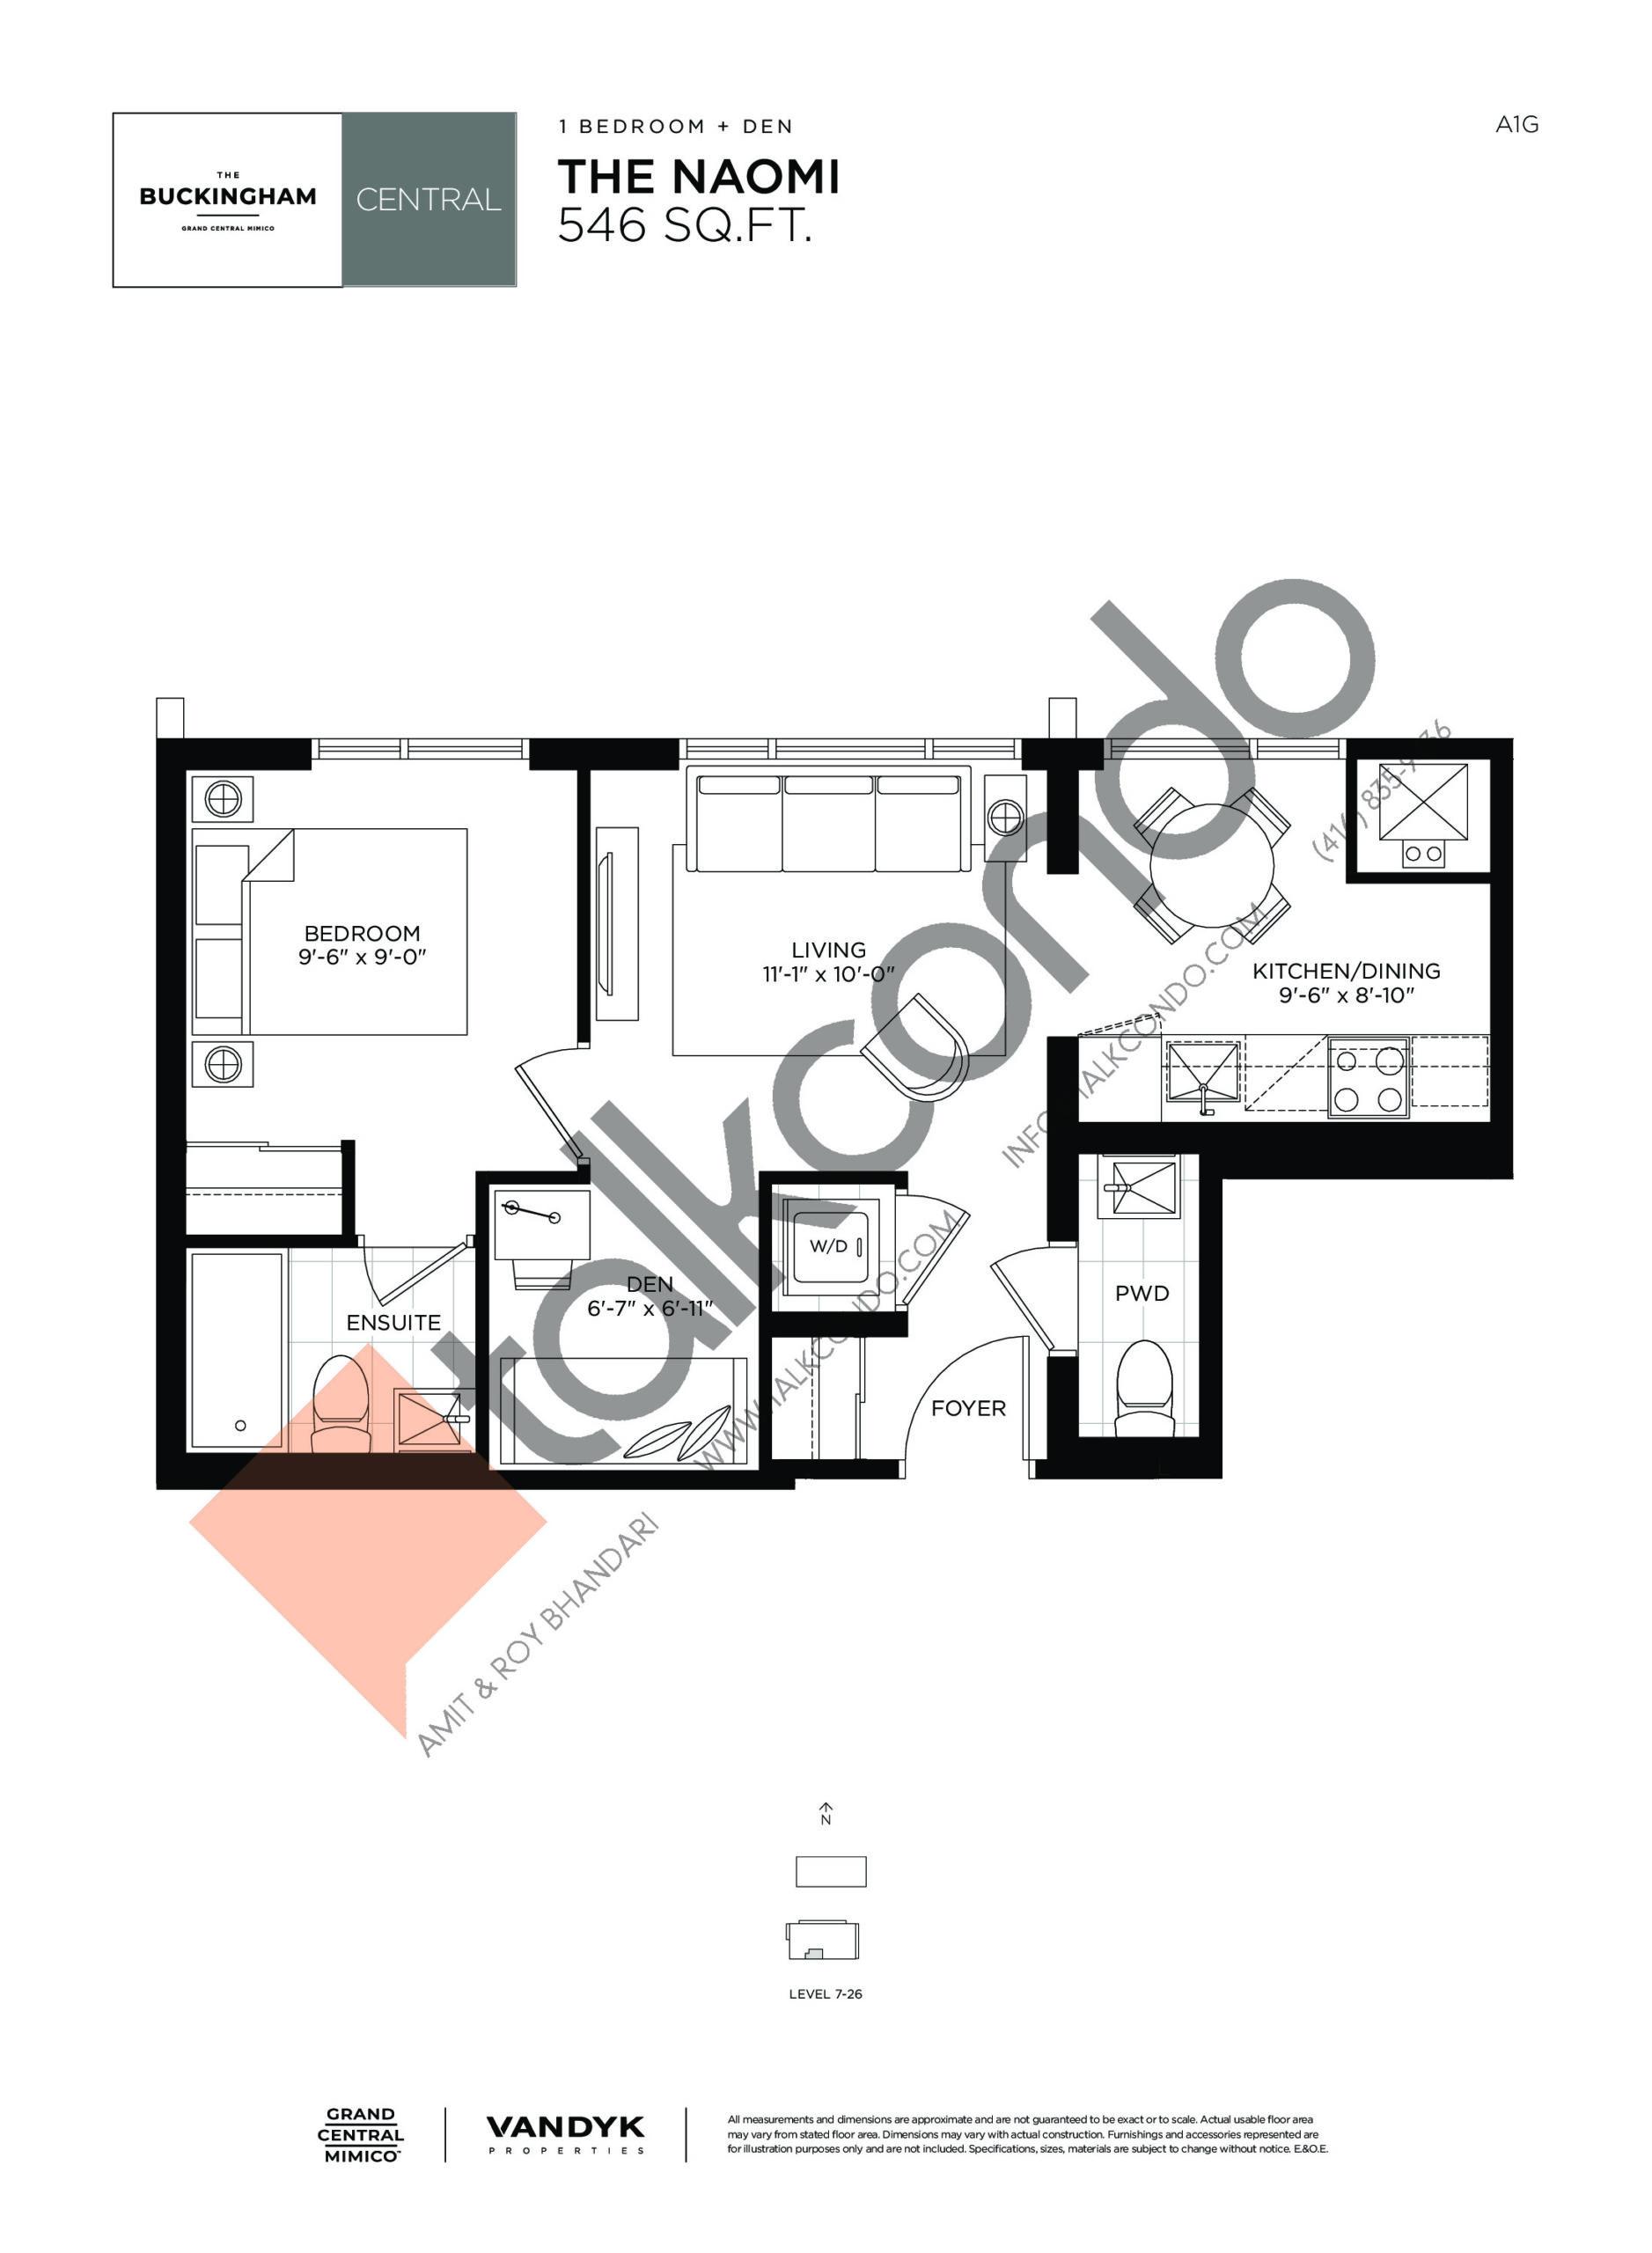 The Naomi Floor Plan at Grand Central Mimico Condos - 546 sq.ft